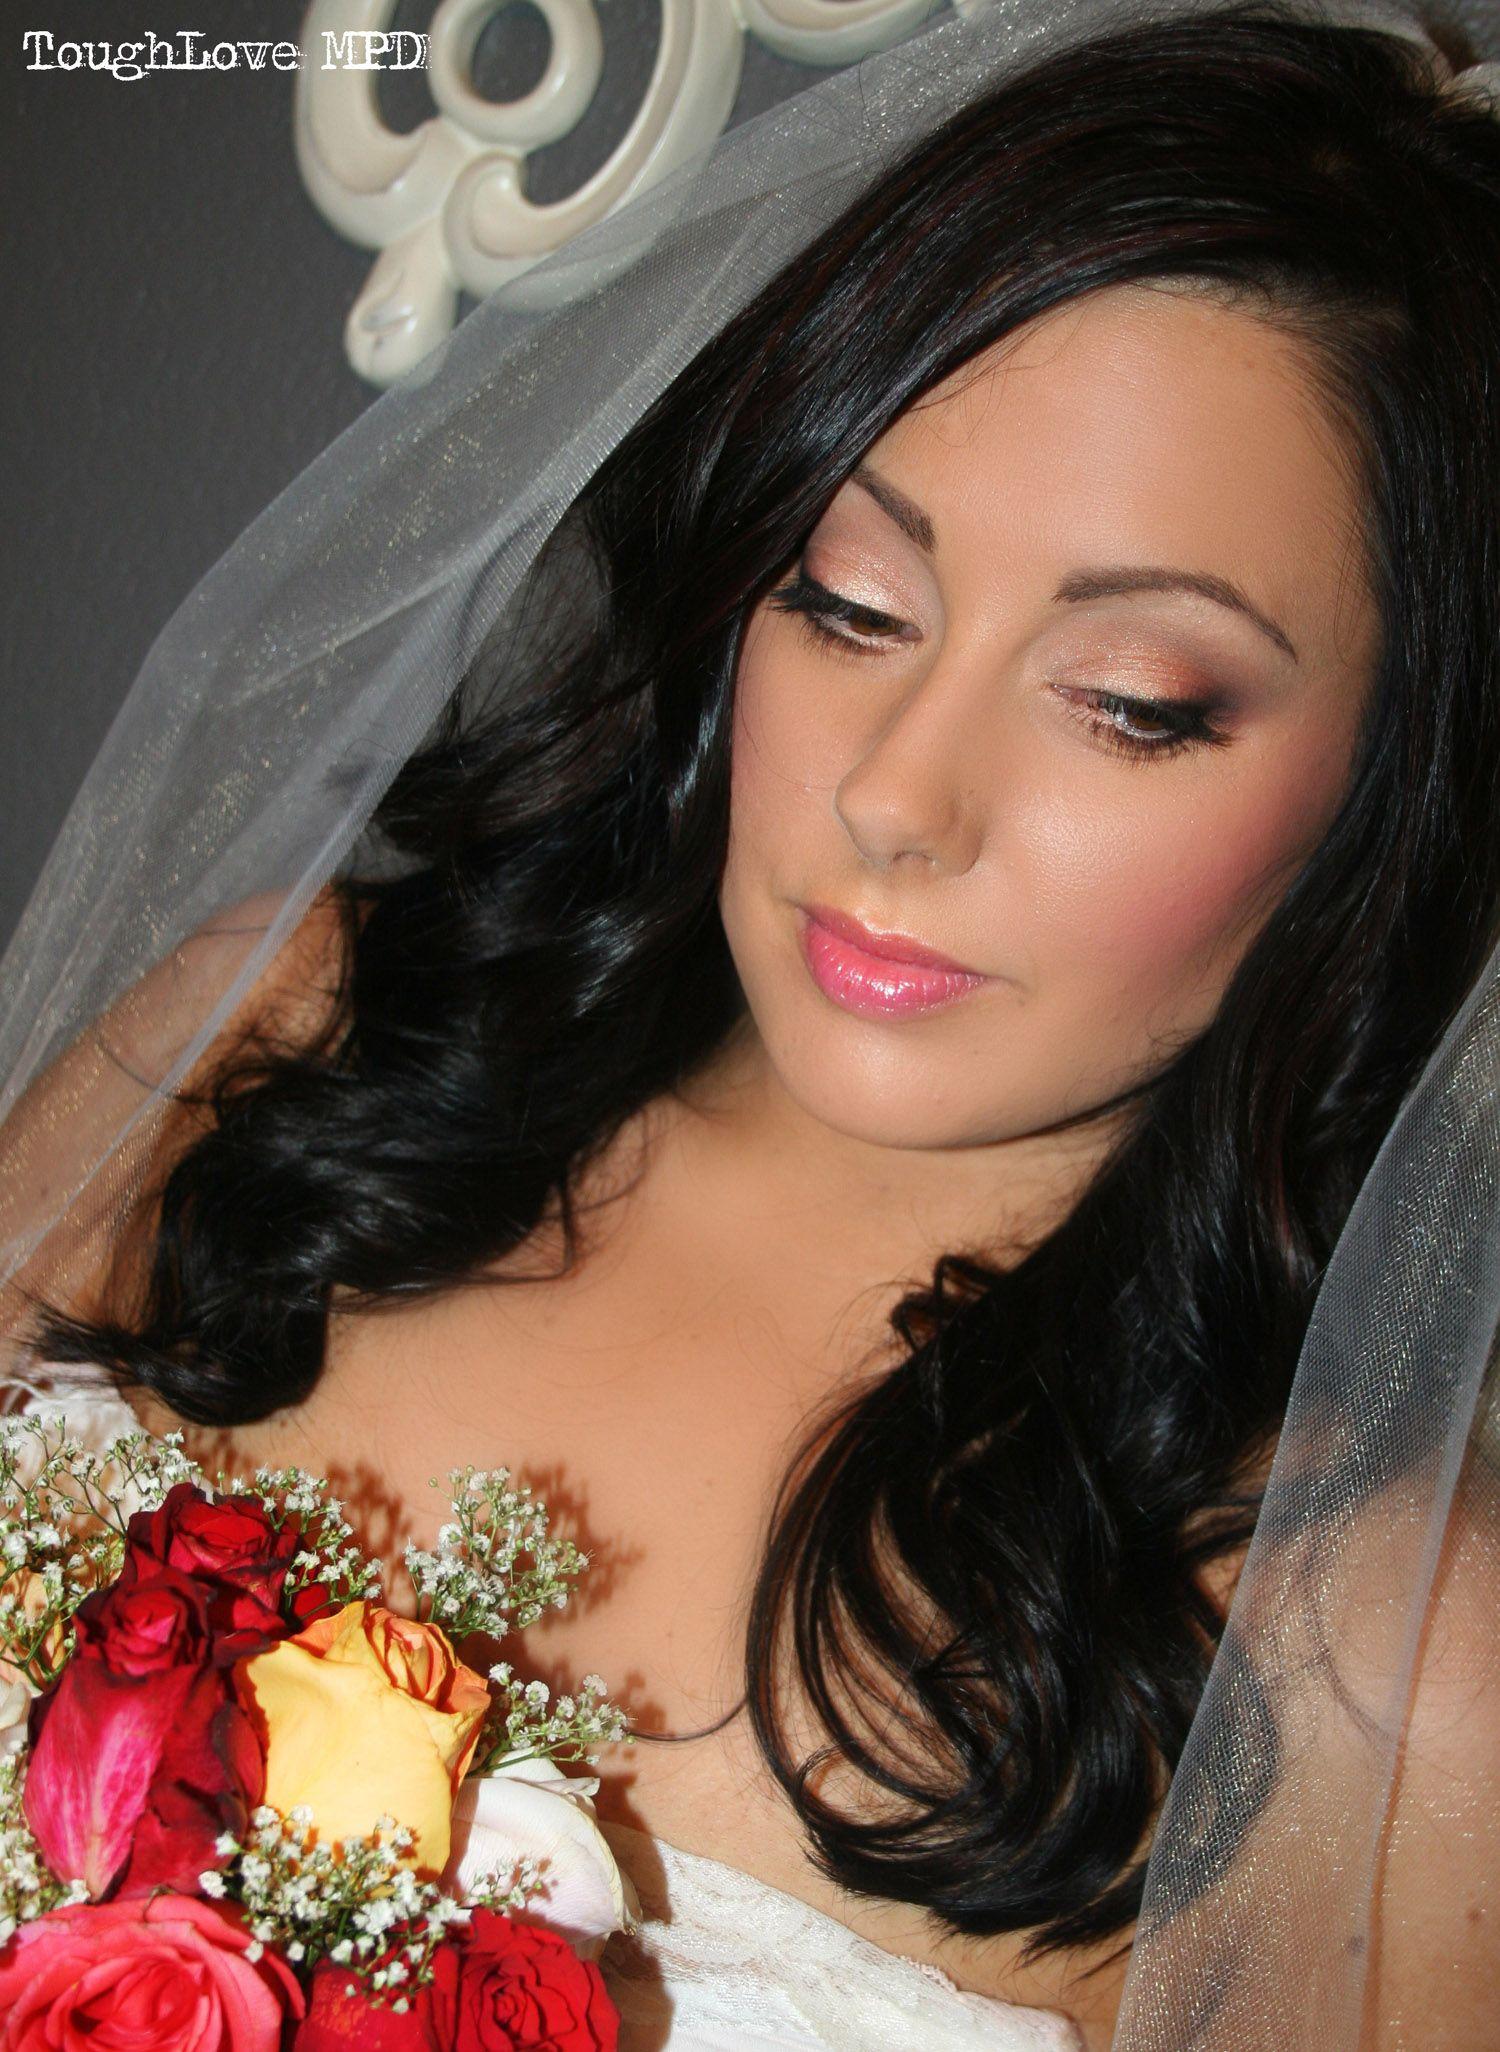 Easy Makeup for the Modern Bride Bride makeup, Wedding